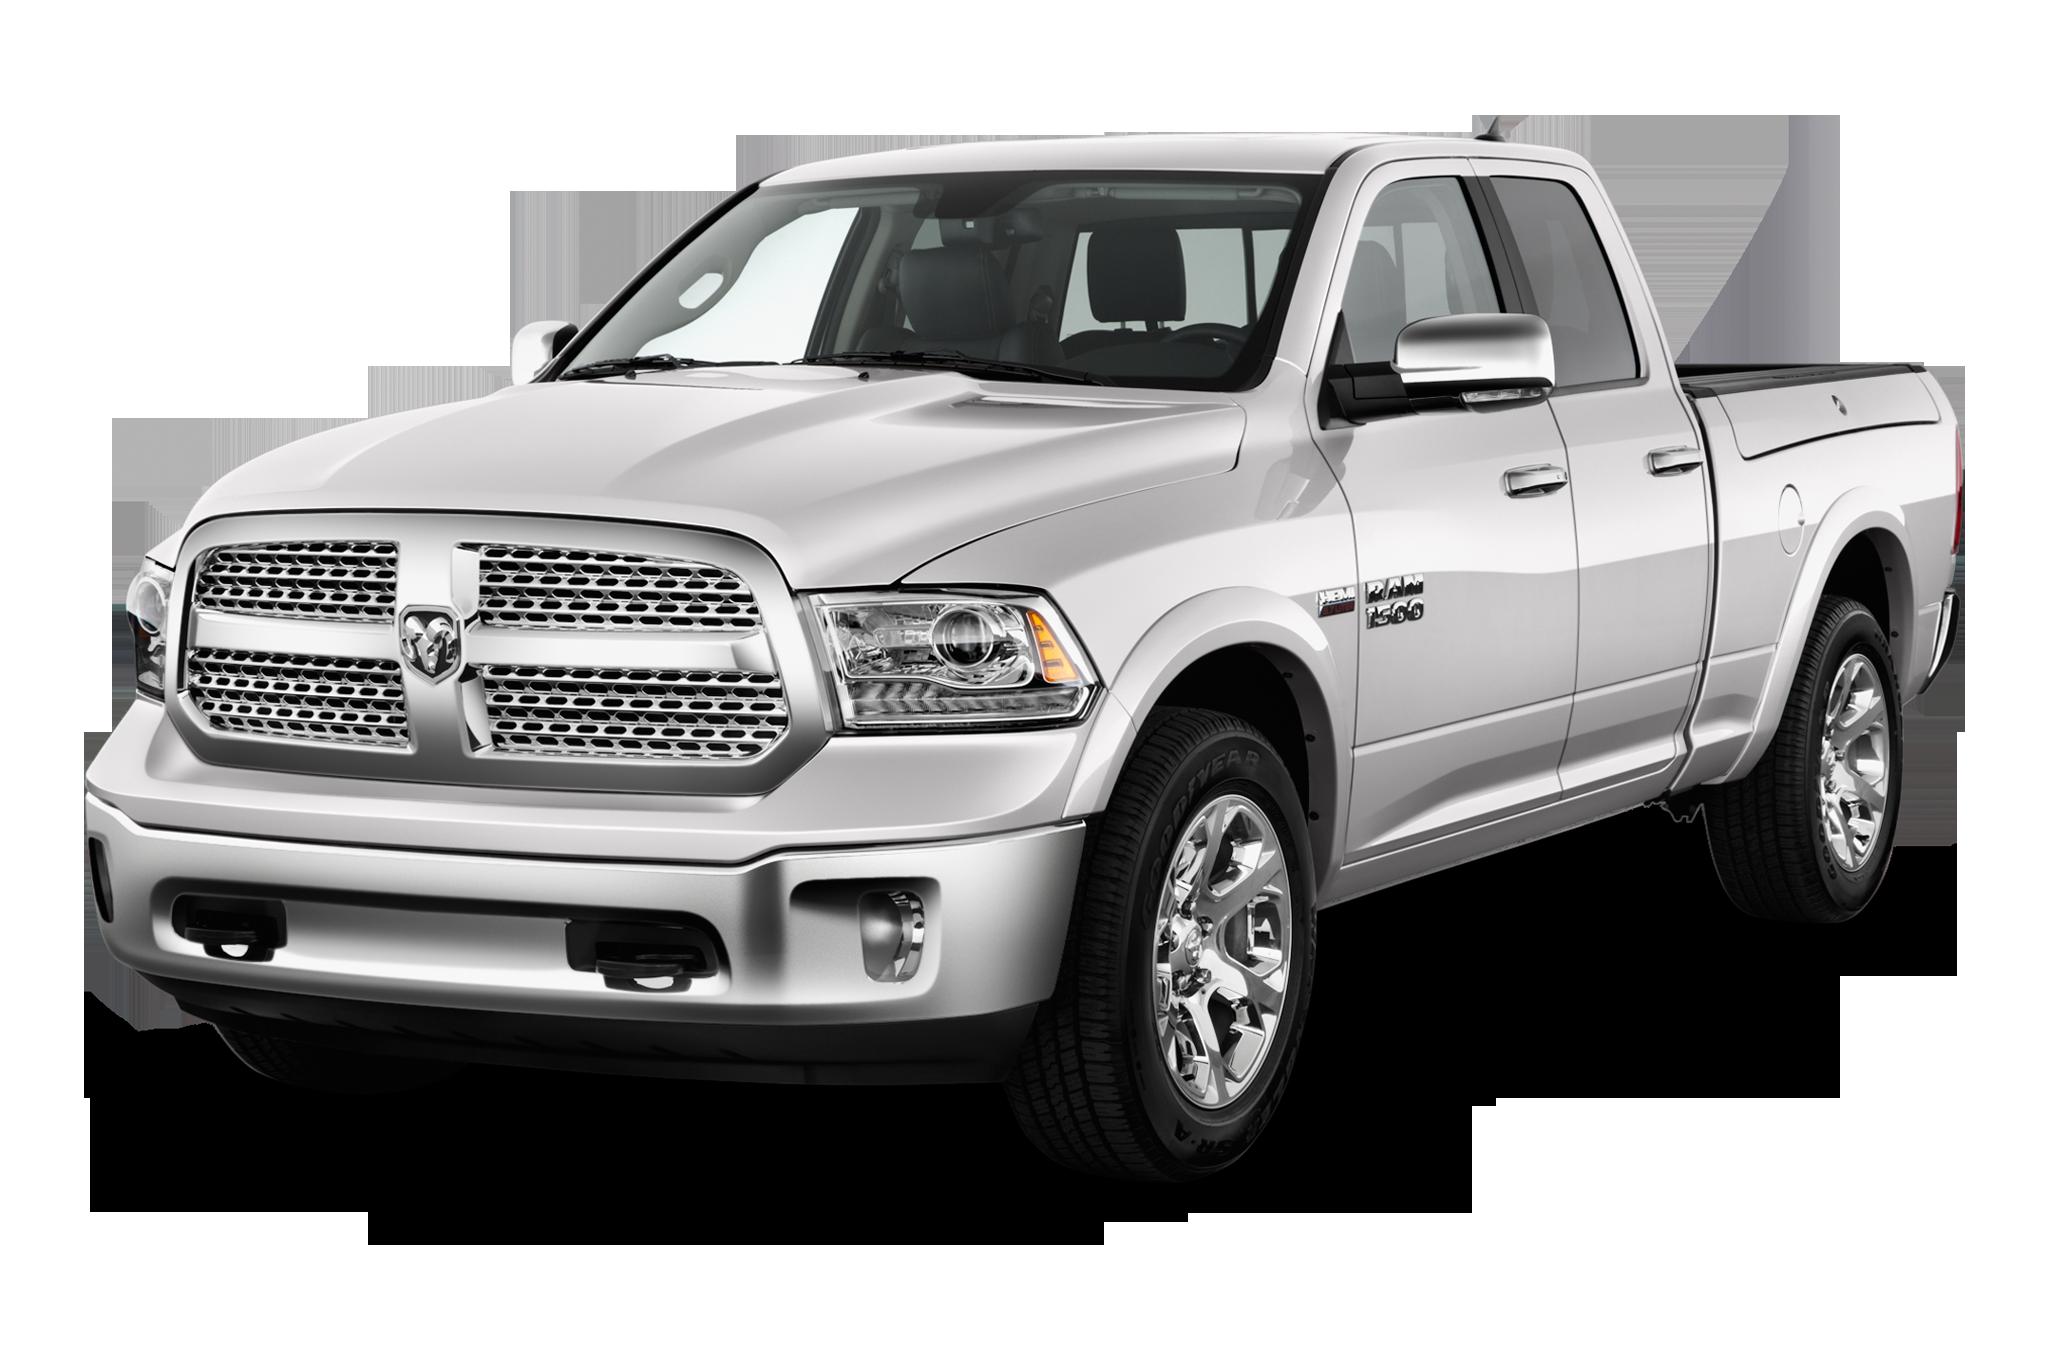 2015-ram-1500-quad-laramie-truck-angular-front